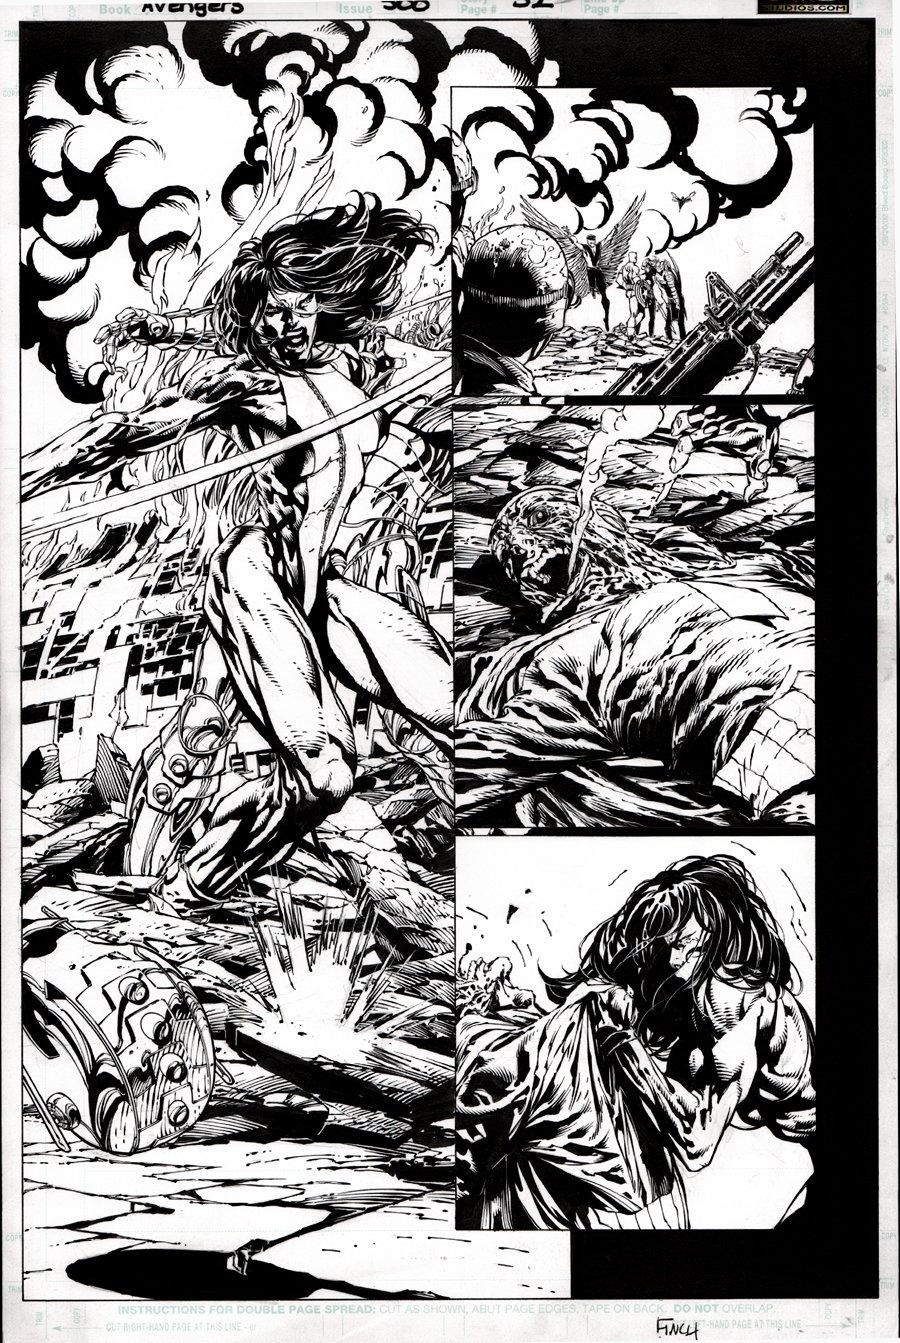 Avengers #500 p 32 SEMI-SPLASH (DEATH OF VISION RIGHT HERE!) 2004